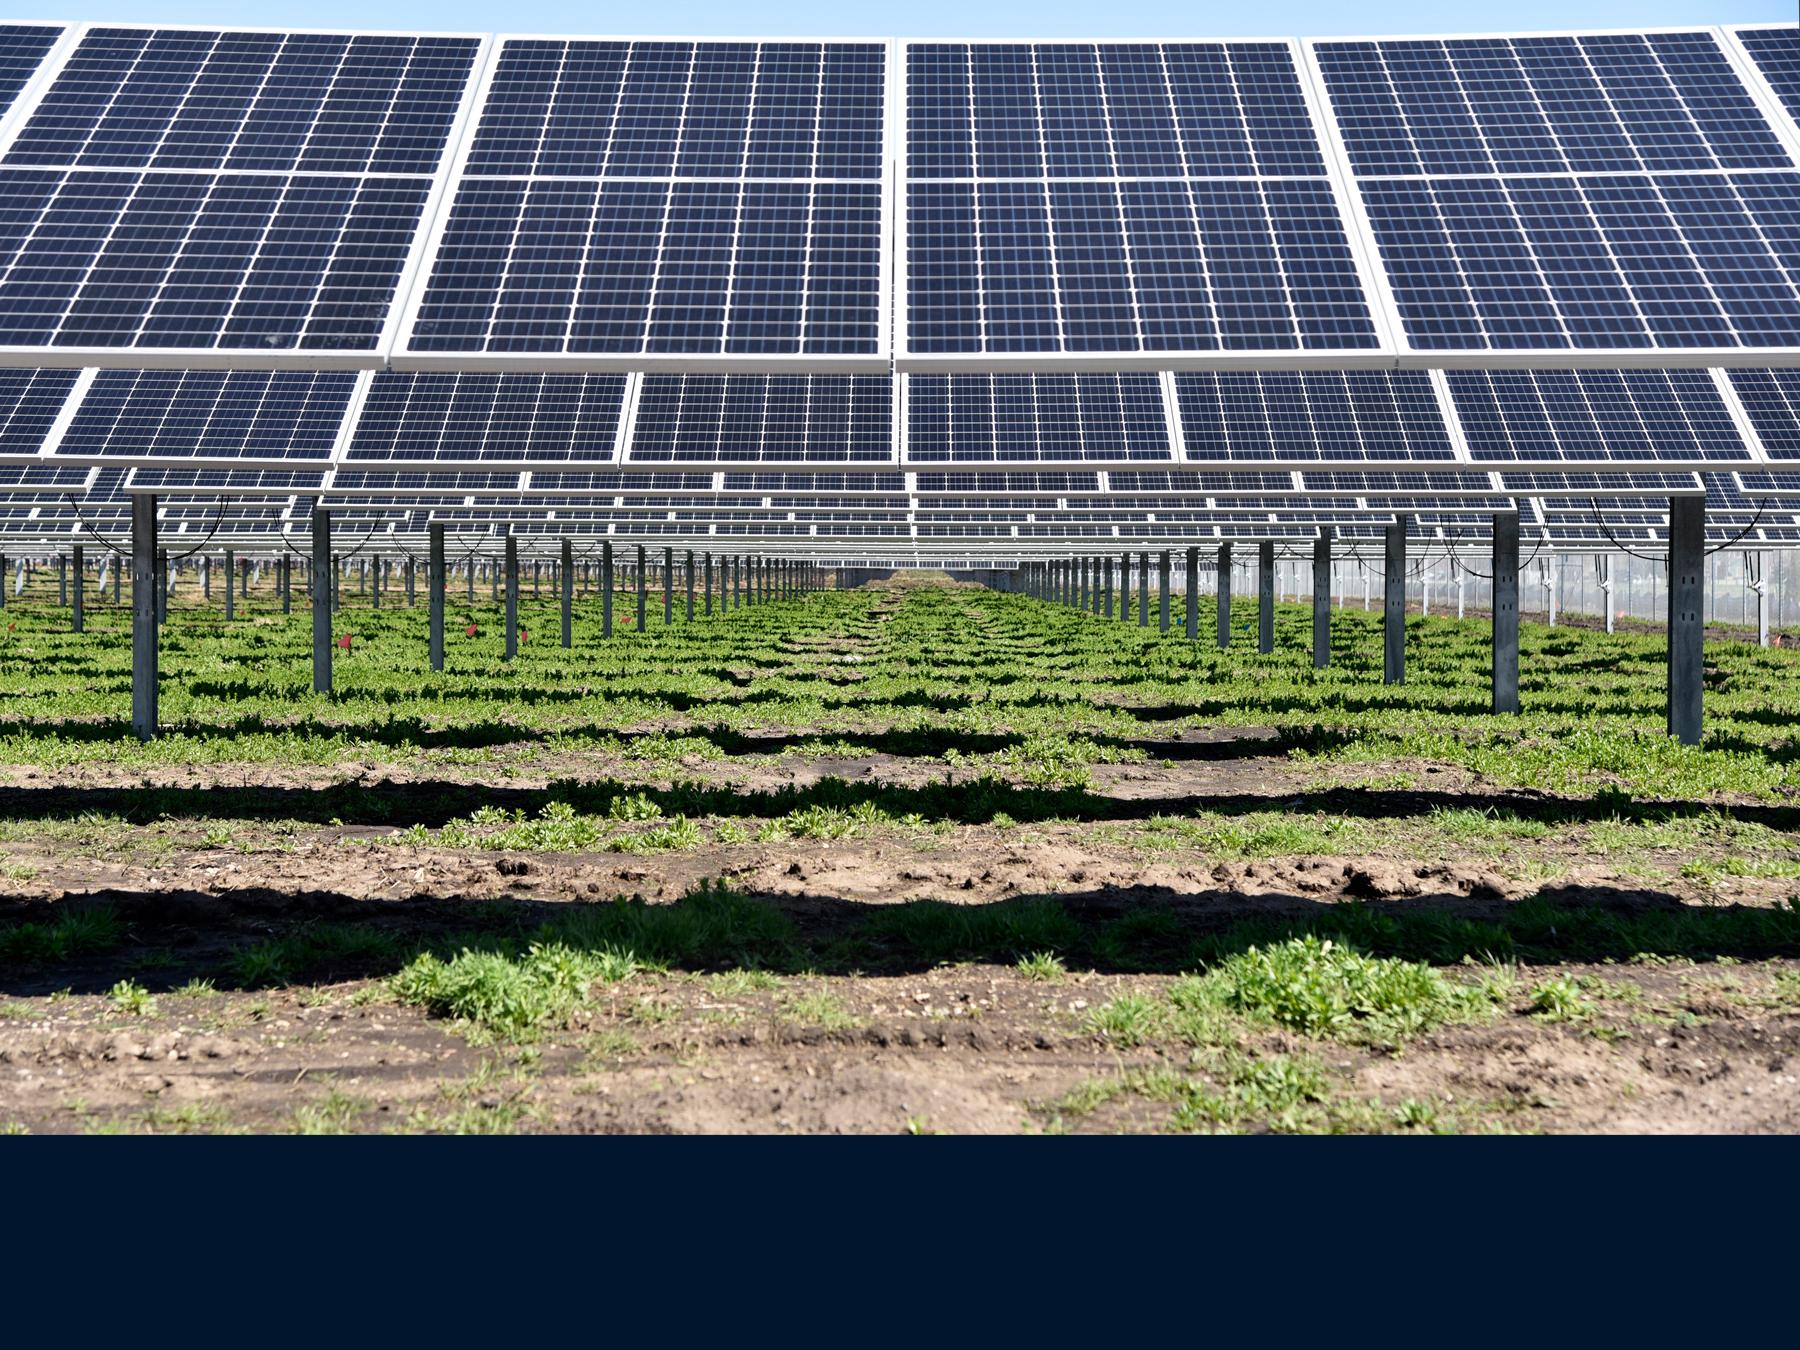 pollinator-friendly plants grow beneath a field of solar panels